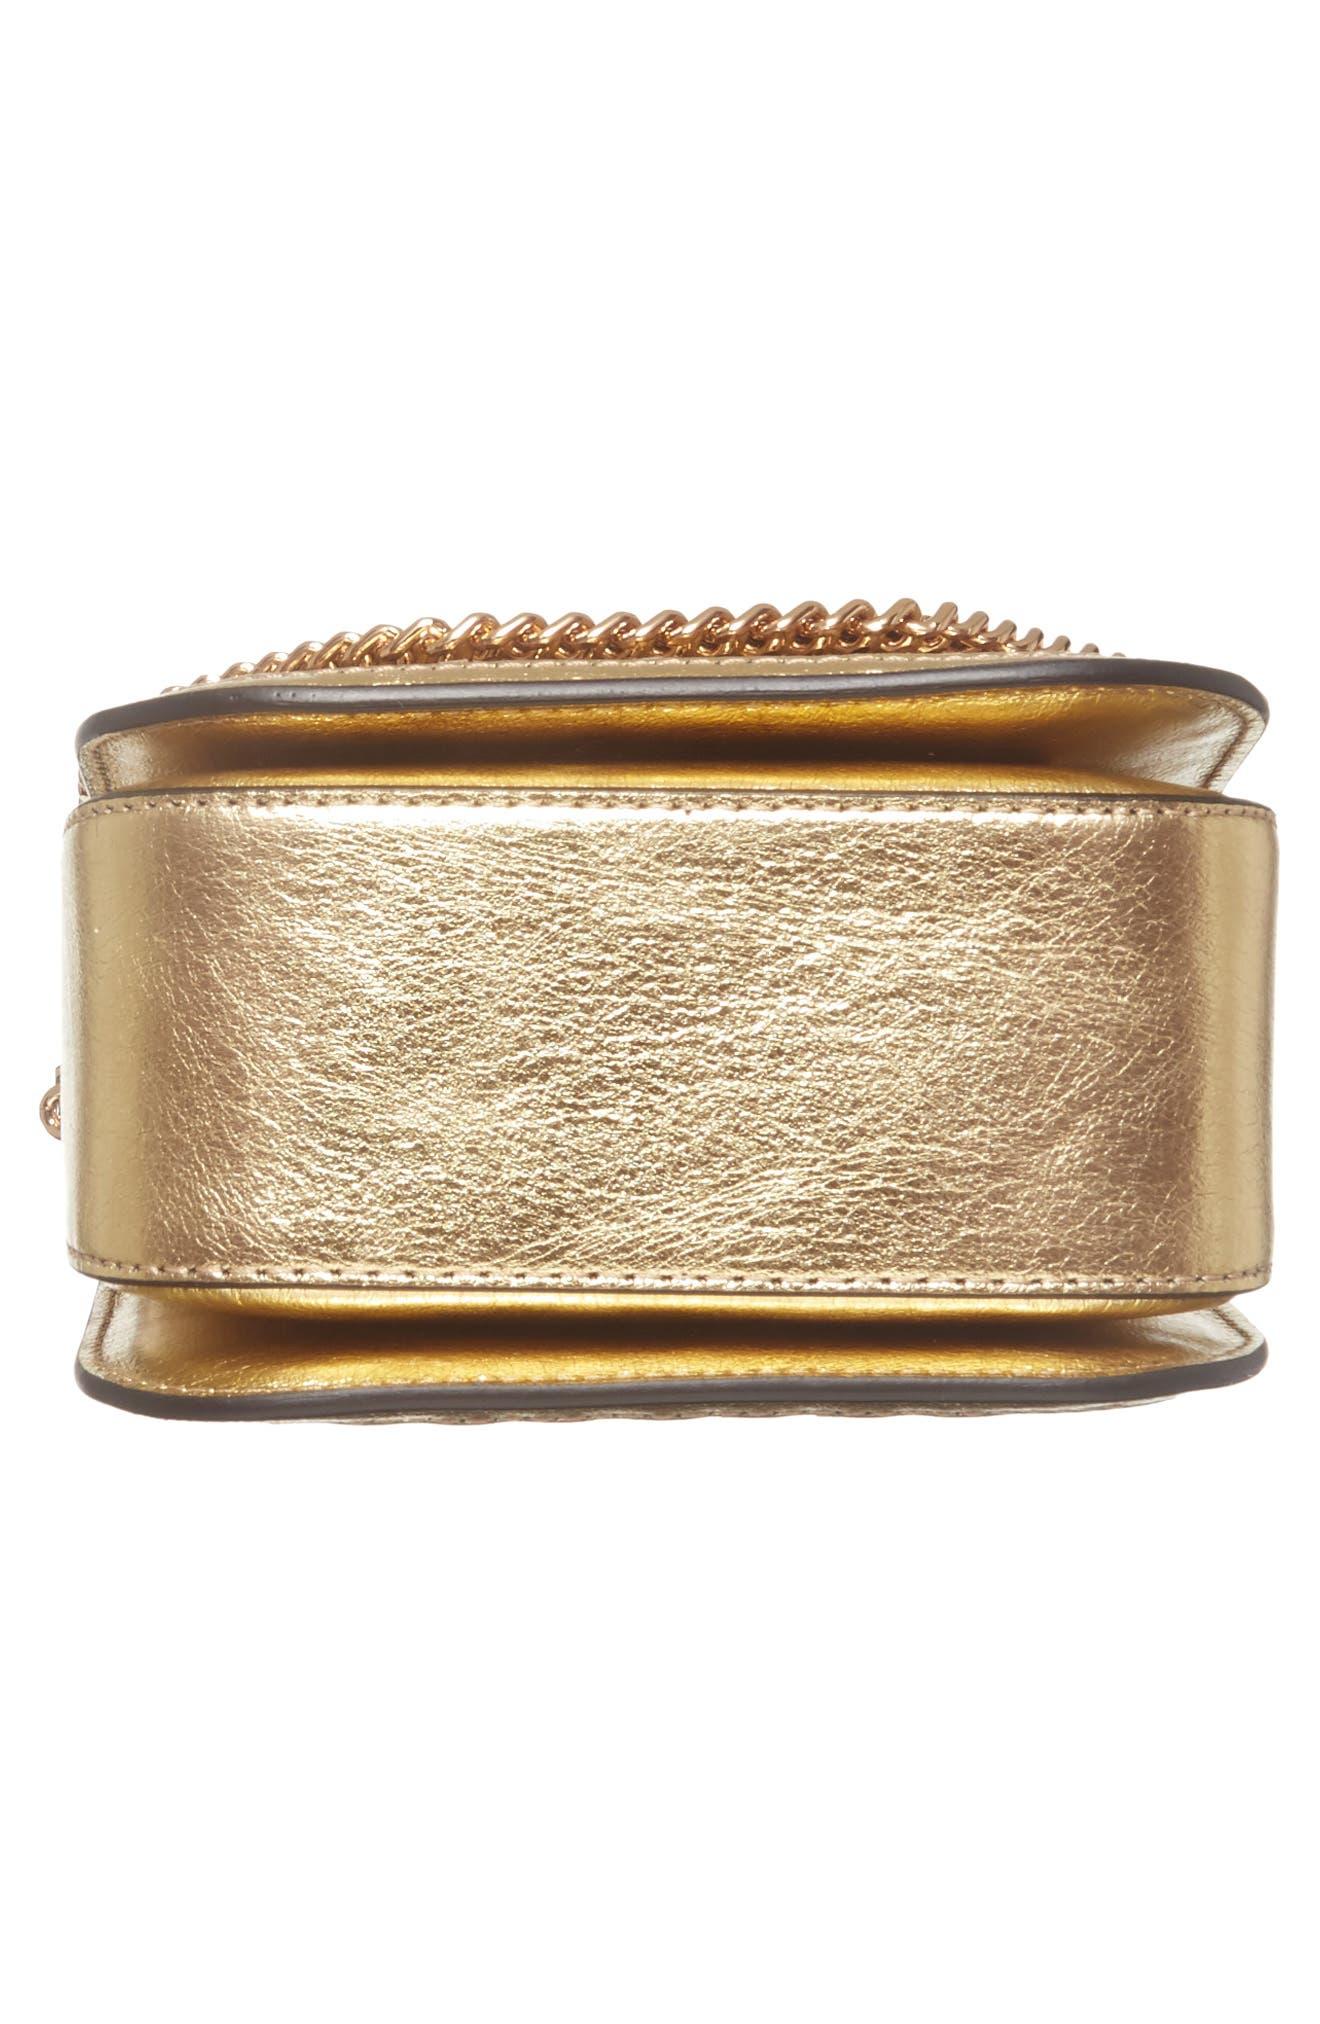 Falabella Box Woven Metallic Faux Leather Shoulder Bag,                             Alternate thumbnail 6, color,